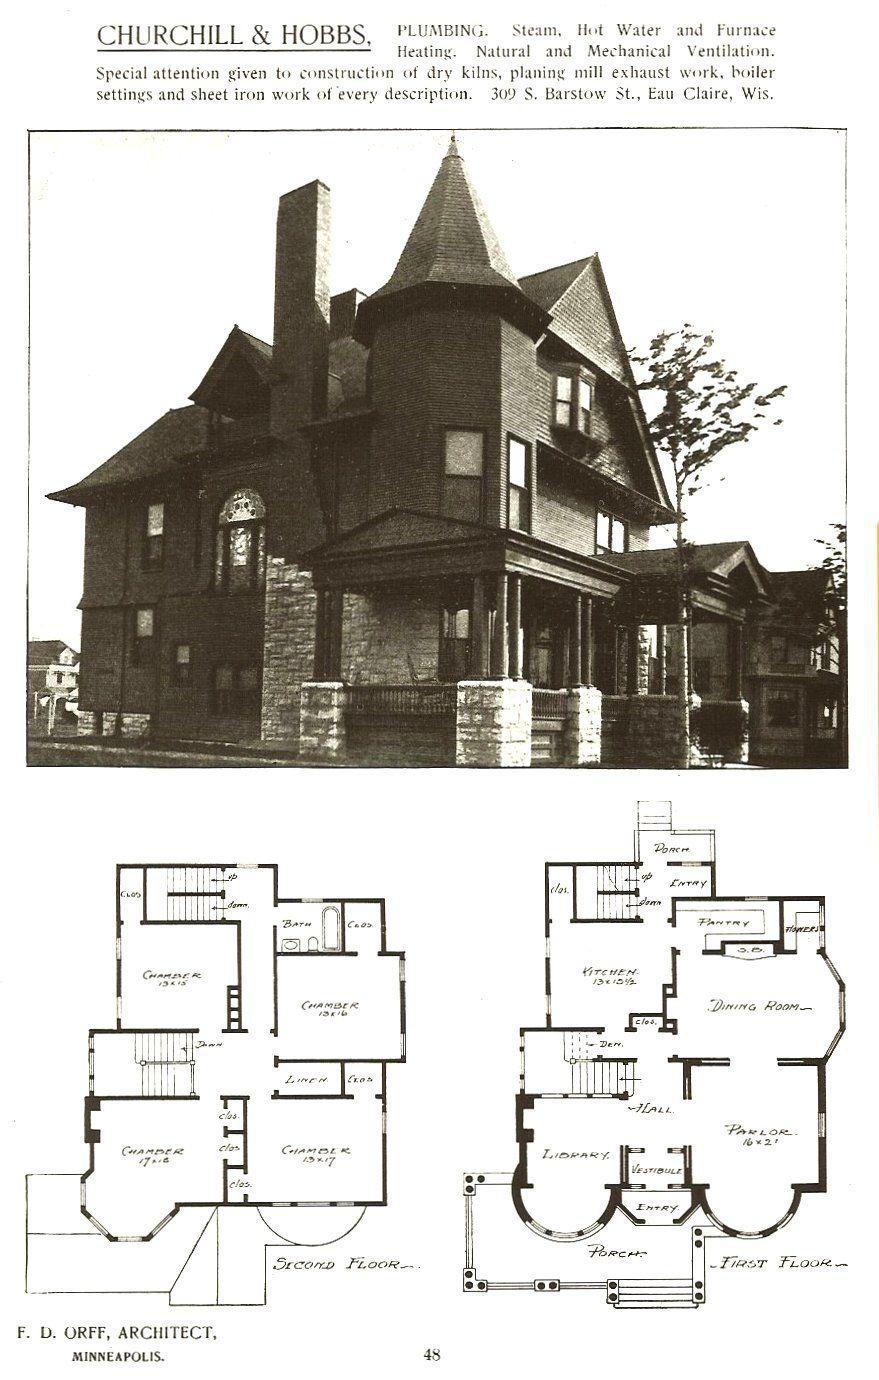 Frank Crowell House 1890 2019 Colfax Ave South Minneapolis Minnesota Bp 24057 Nov 8 1890 Arch Victorian House Plans Vintage House Plans Best House Plans